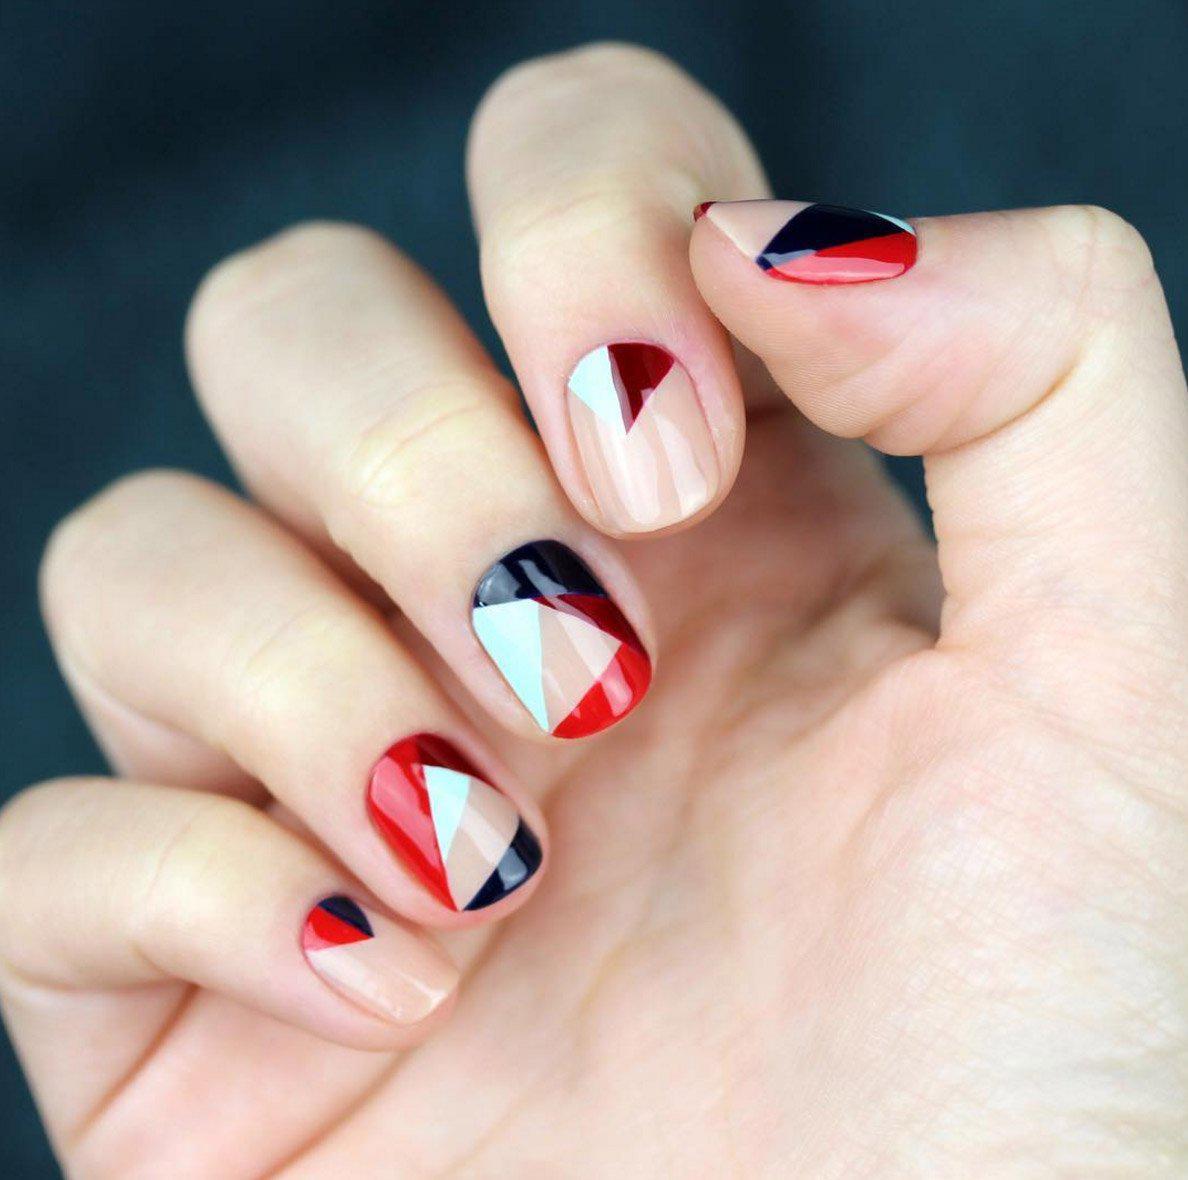 image14-62 | Модный дизайн ногтей — фото новинок маникюра 2018